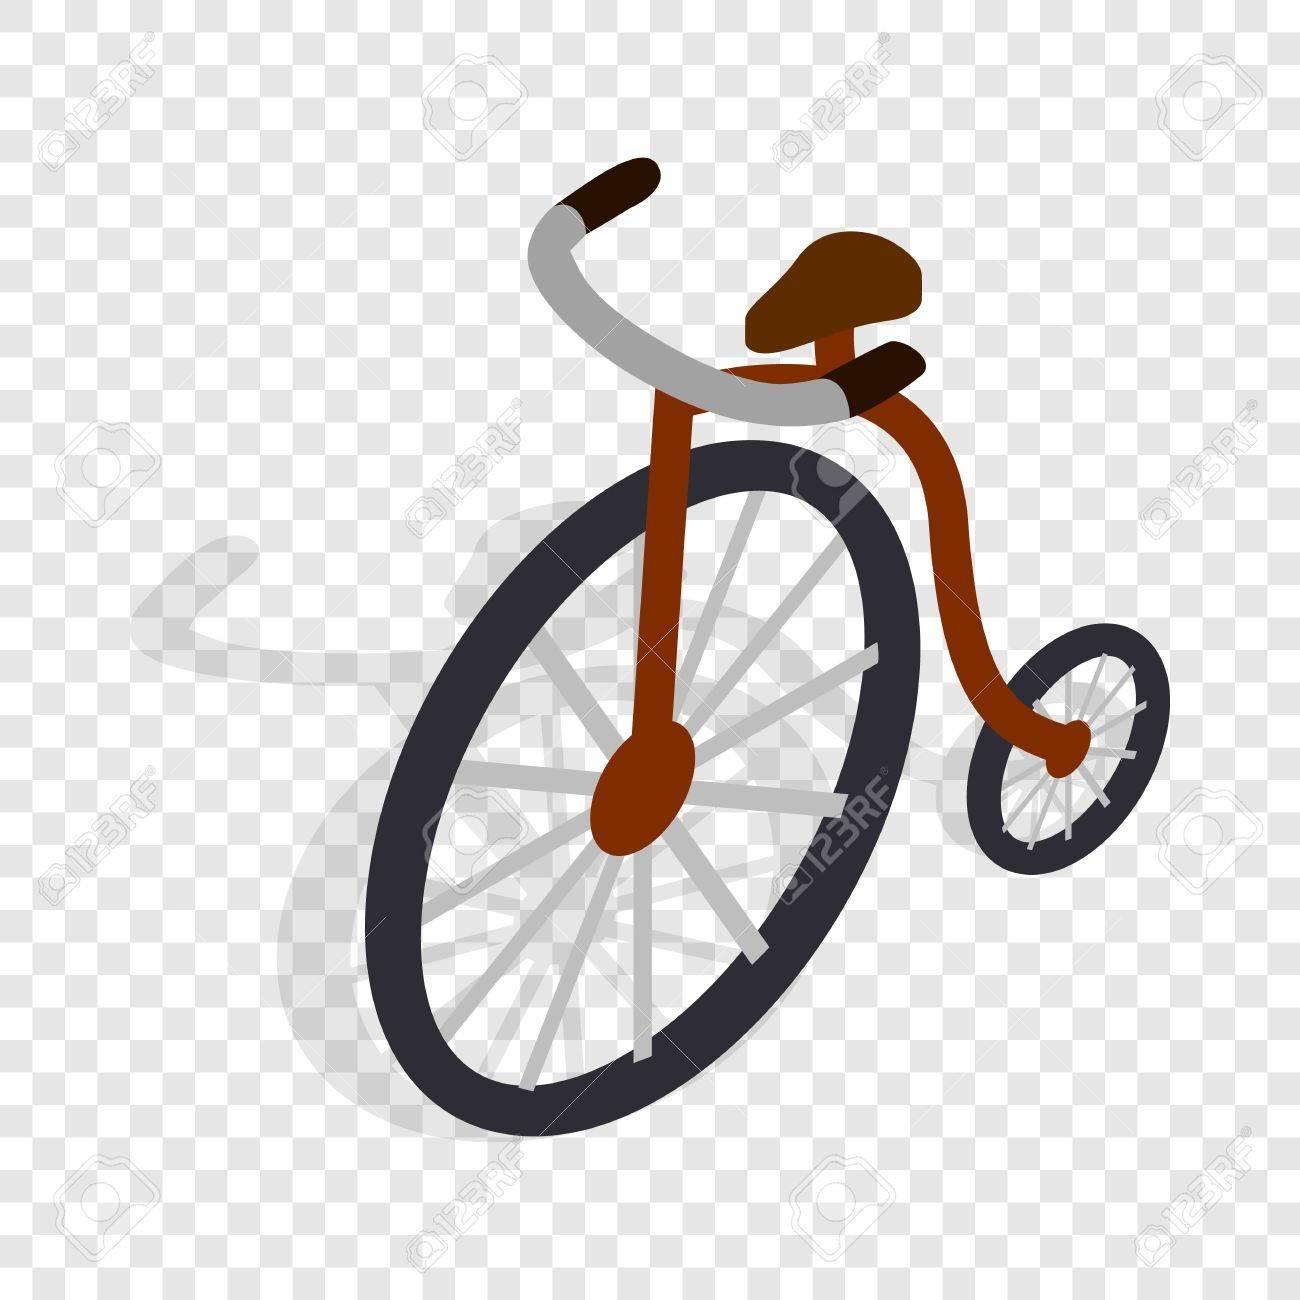 73224174-highwheel-bike-isometric-icon-3d-on-a-transparent-background-vector-illustration.jpg